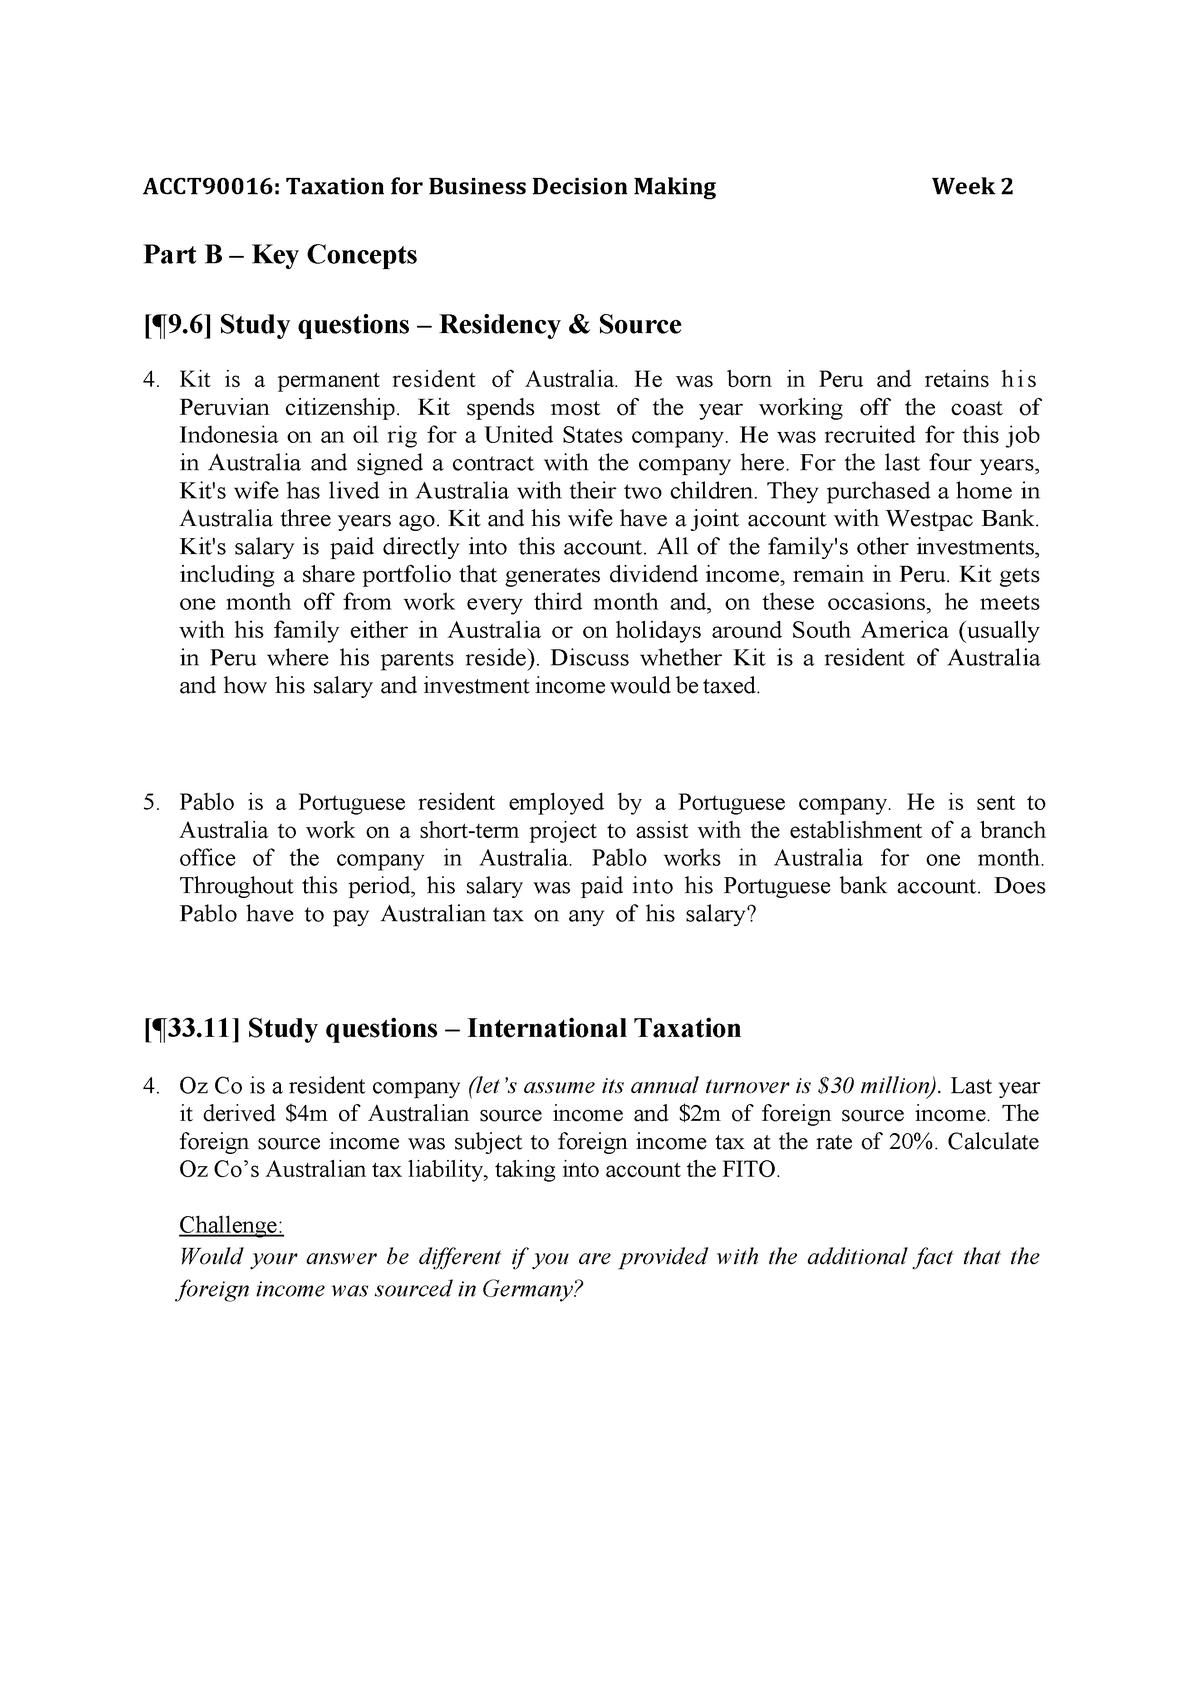 QS B - BLAW30003 Taxation Law II - Unimelb - StuDocu